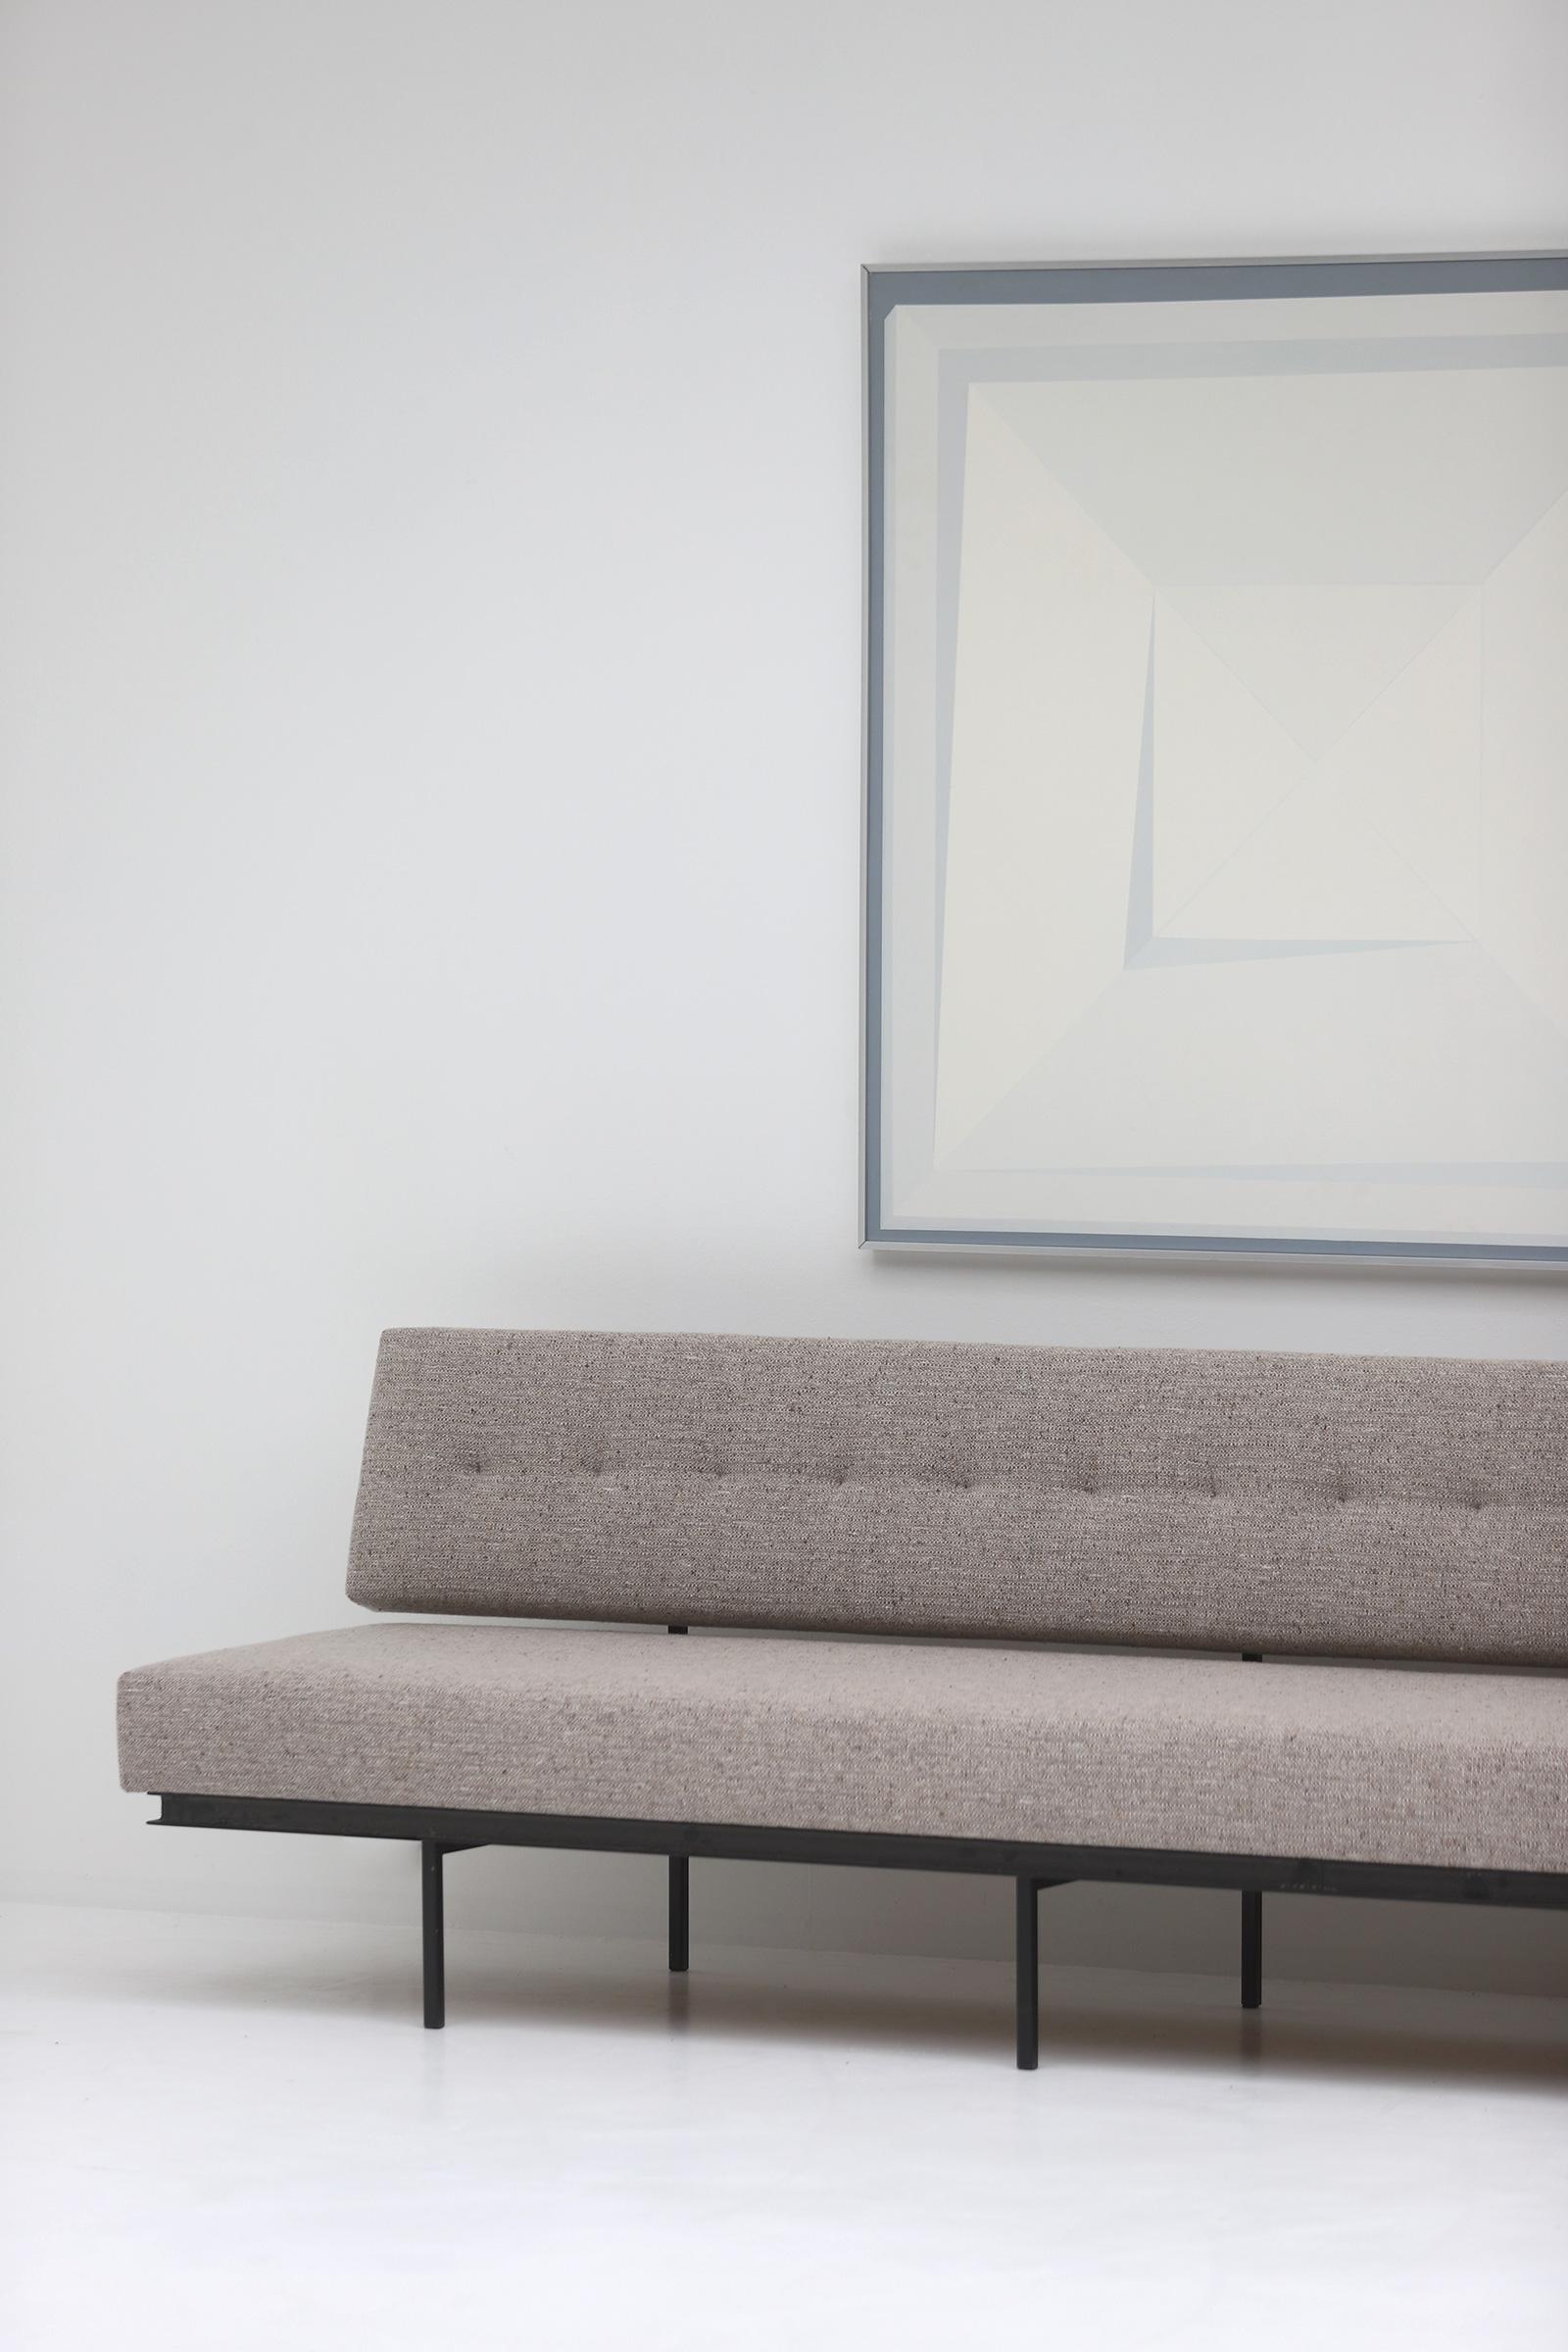 Florence Knoll Sofa & Cabinet image 6